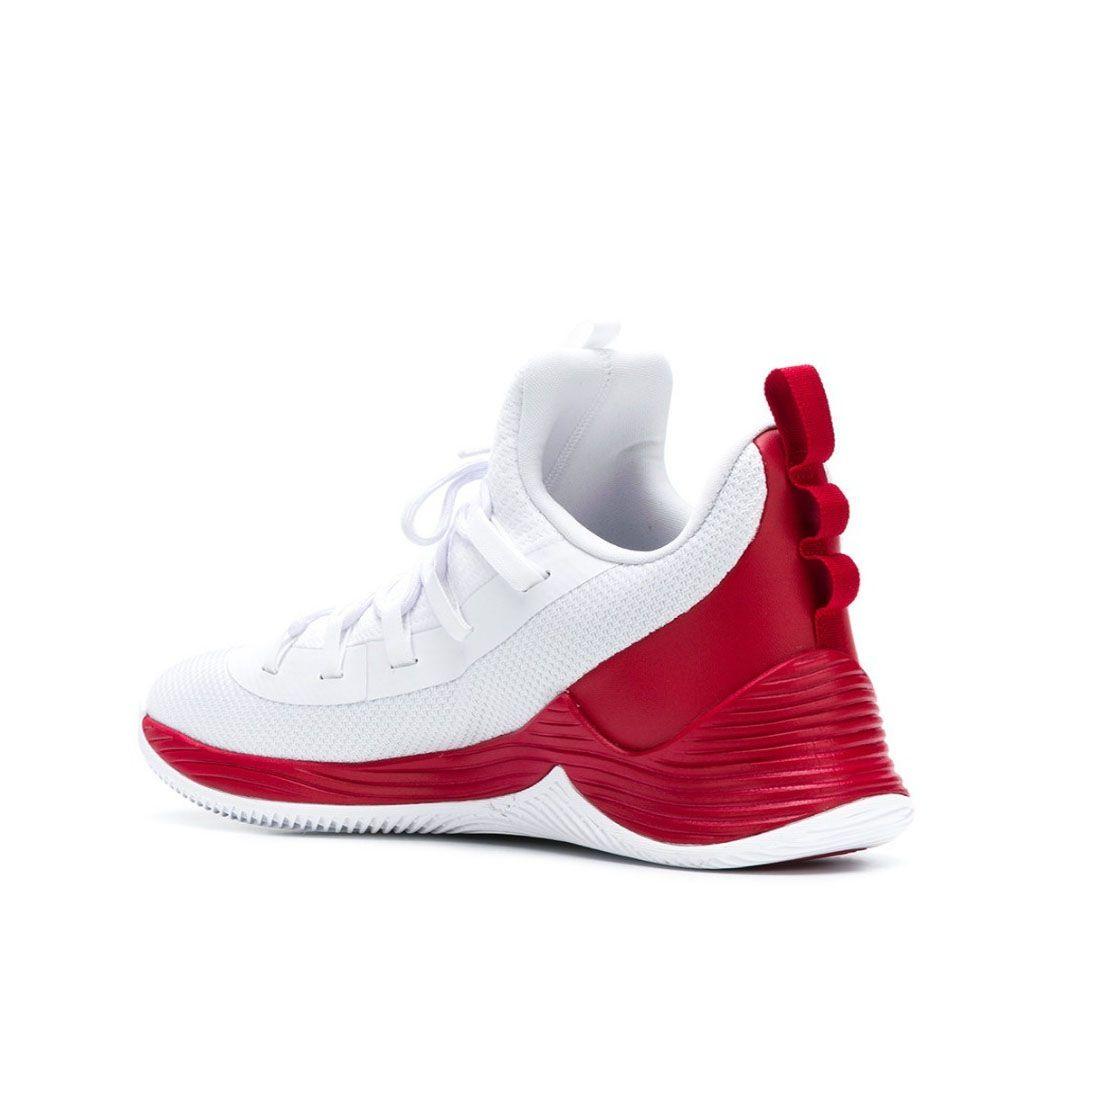 3e203c070cc77 ... Tênis Nike Jordan Ultra Fly 2 Low Nº43